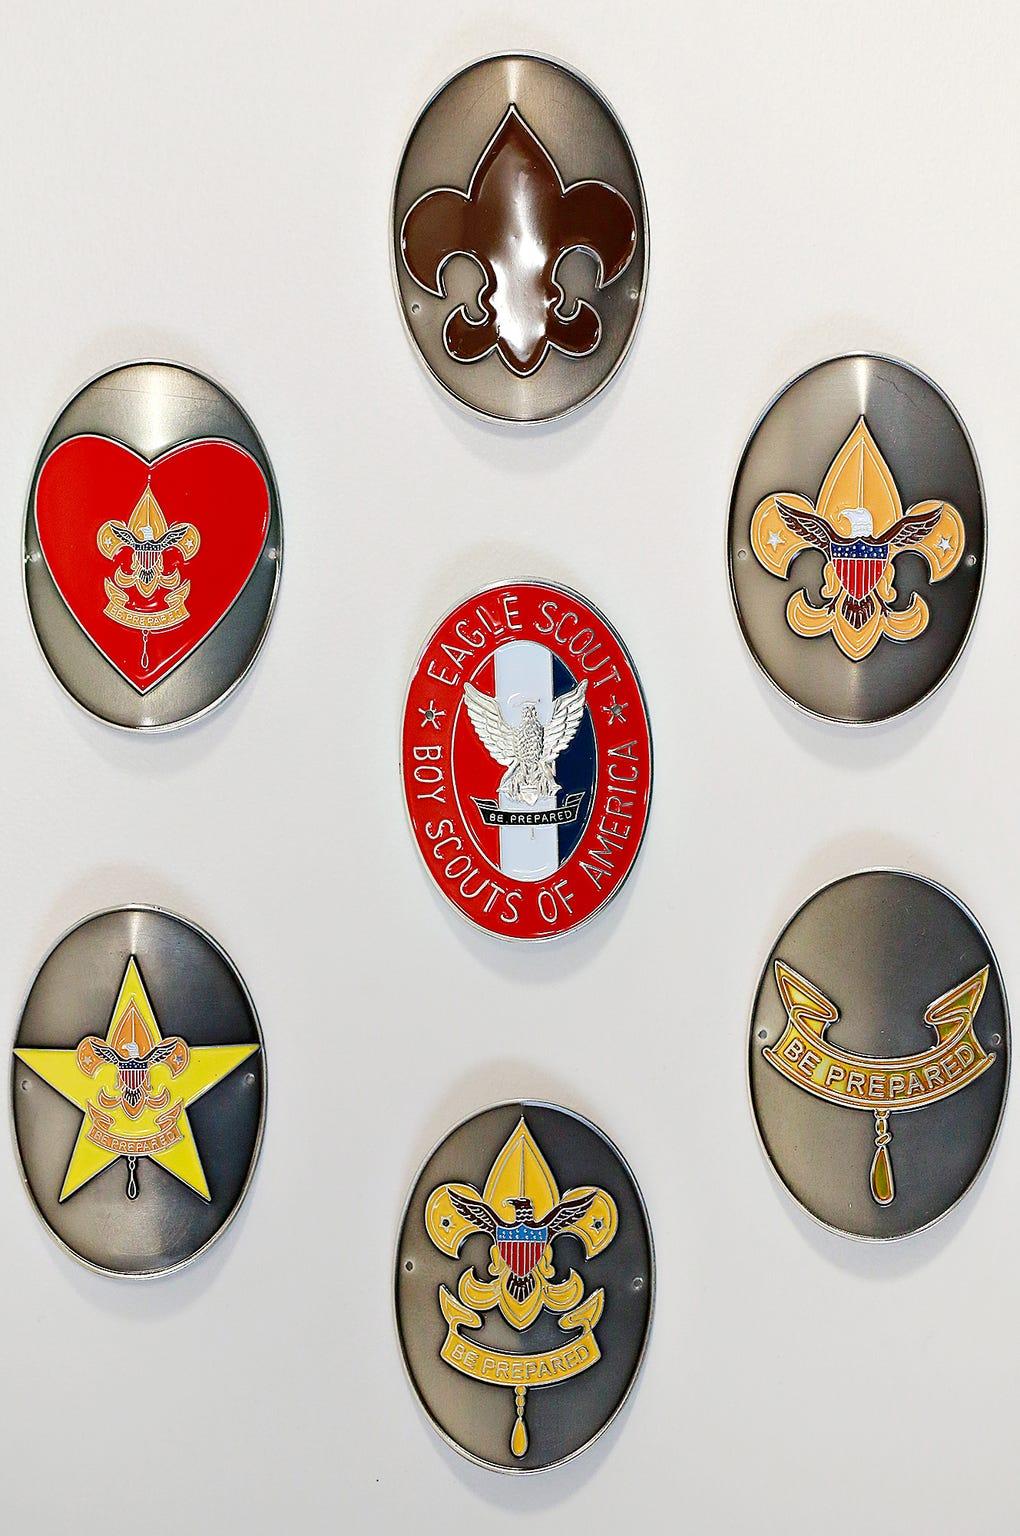 Boy Scouts of America photo illustration